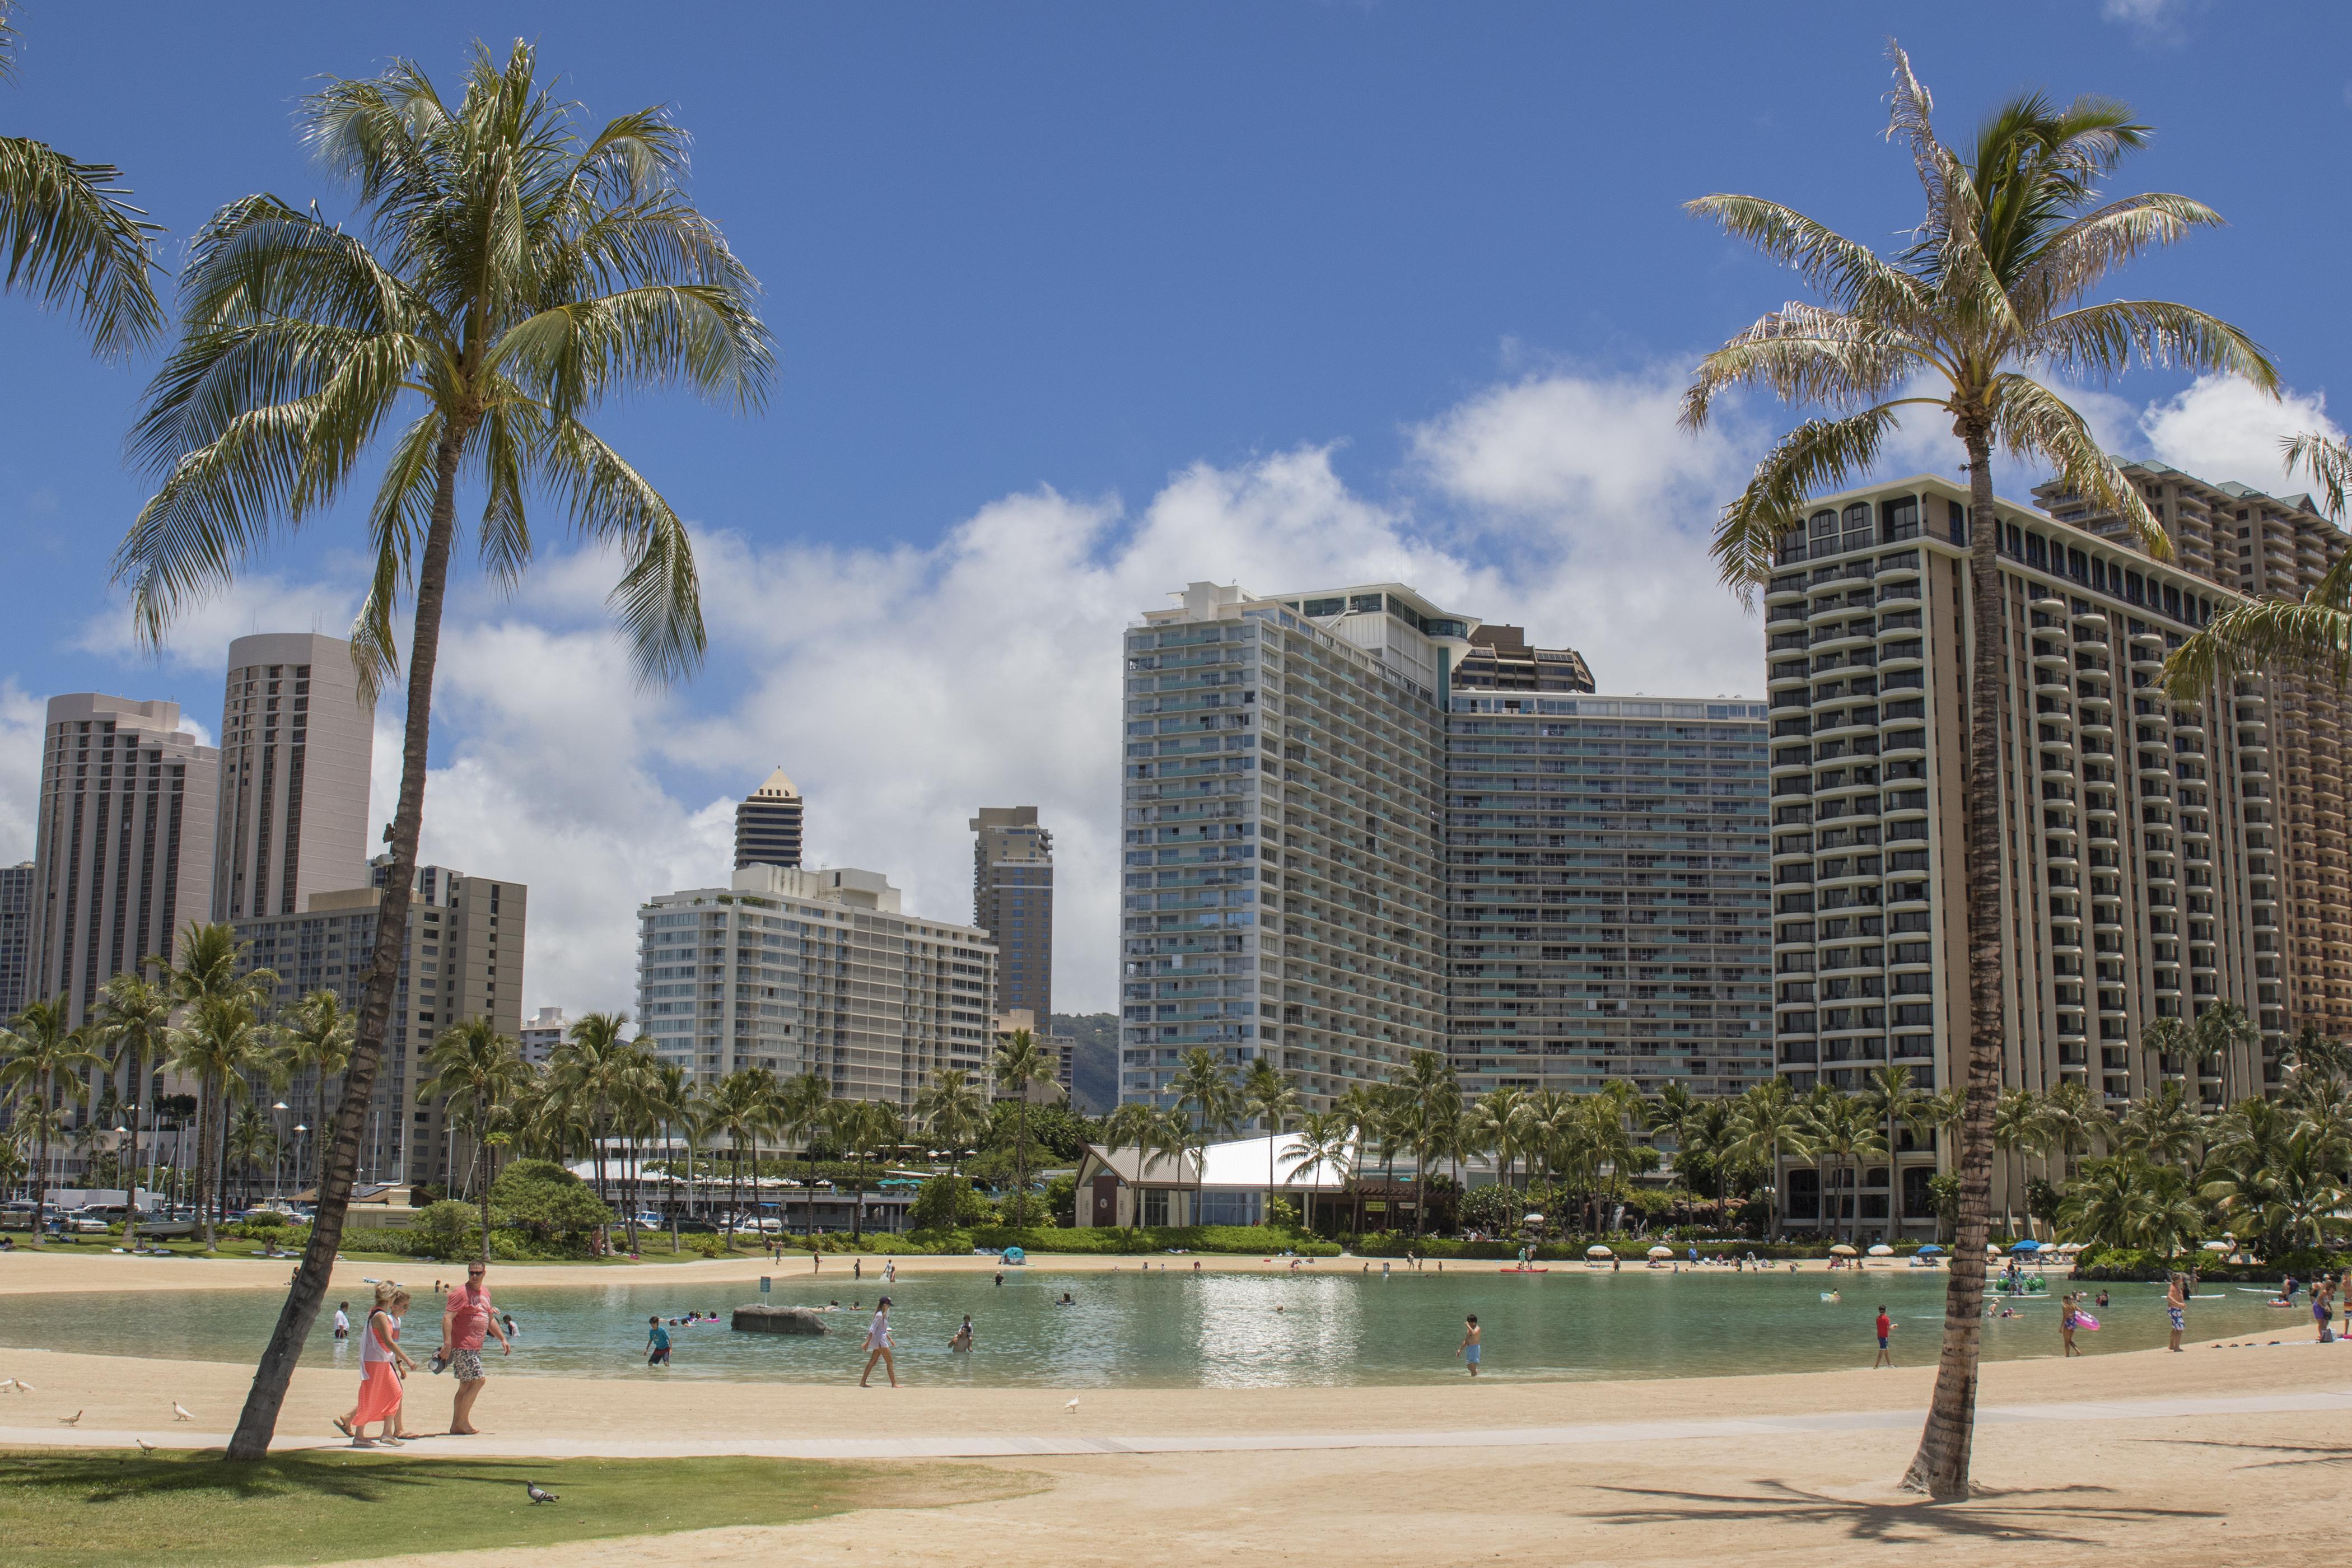 From Waikiki beach, looking at the Ilikai beyond the lagoon